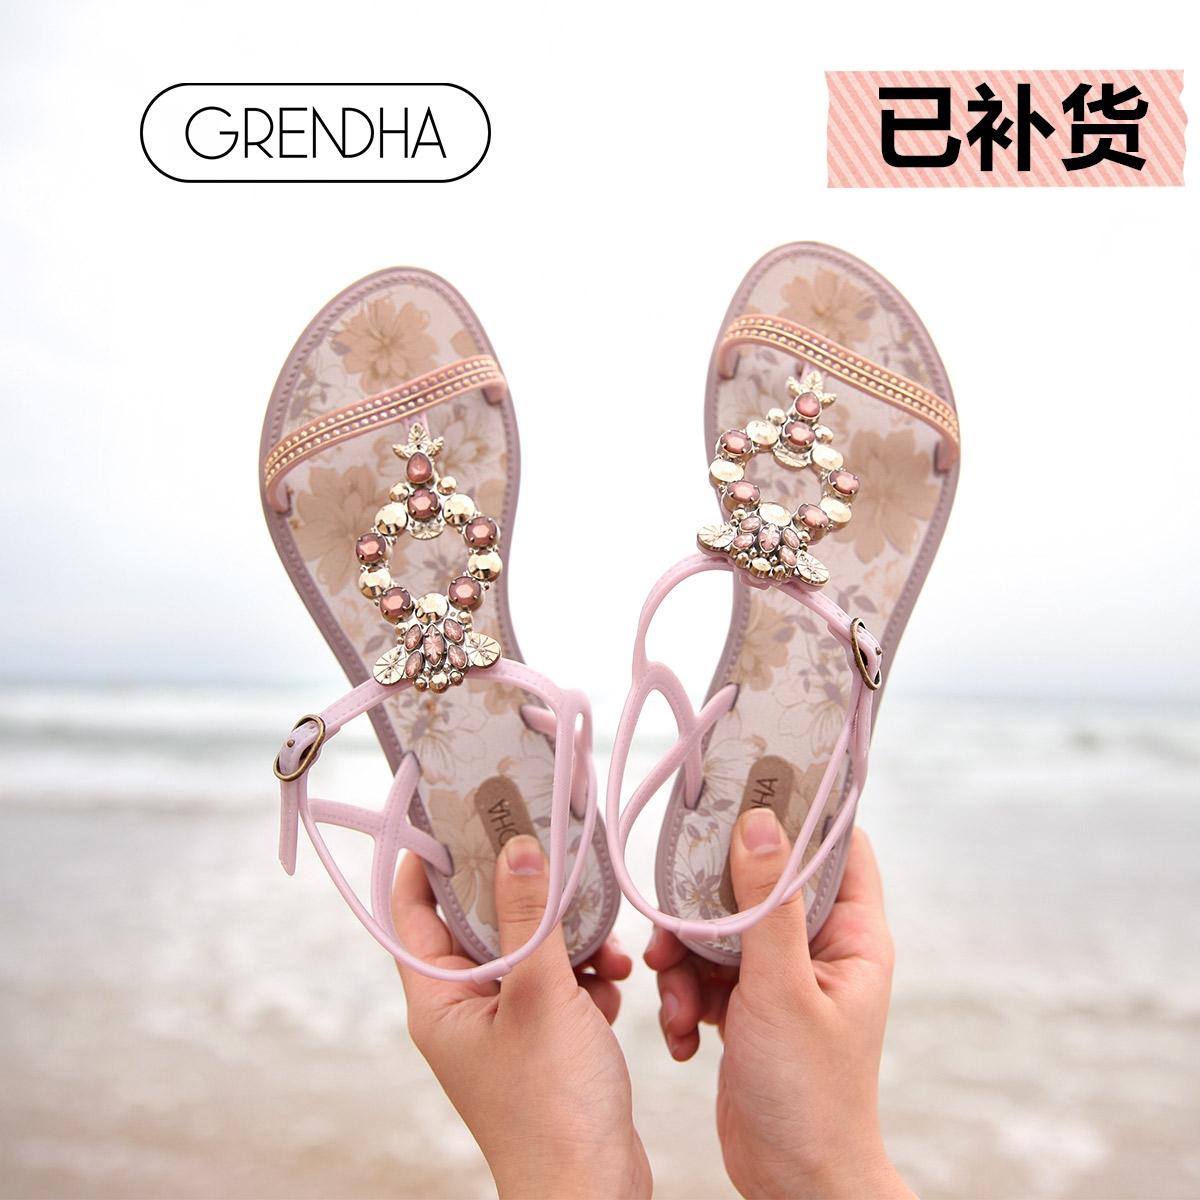 GRENDHA巴西春夏新花钻系列平跟度假休闲仙女风夹趾凉拖鞋女印花